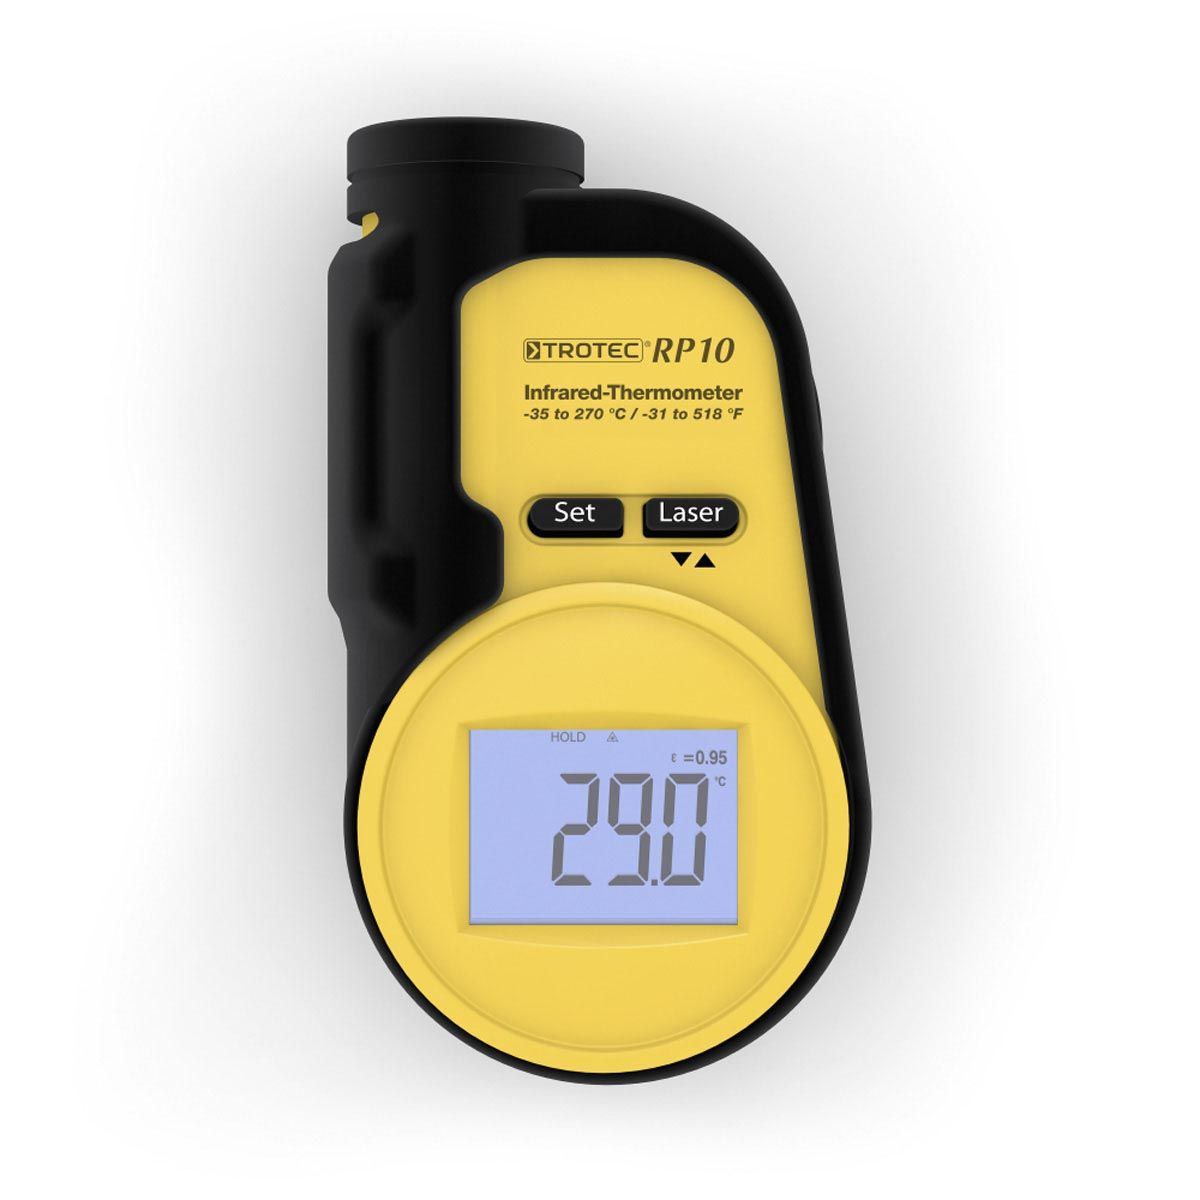 Infrarot-Thermometer, RP10, schwarz, 53 x 97 x 25 mm